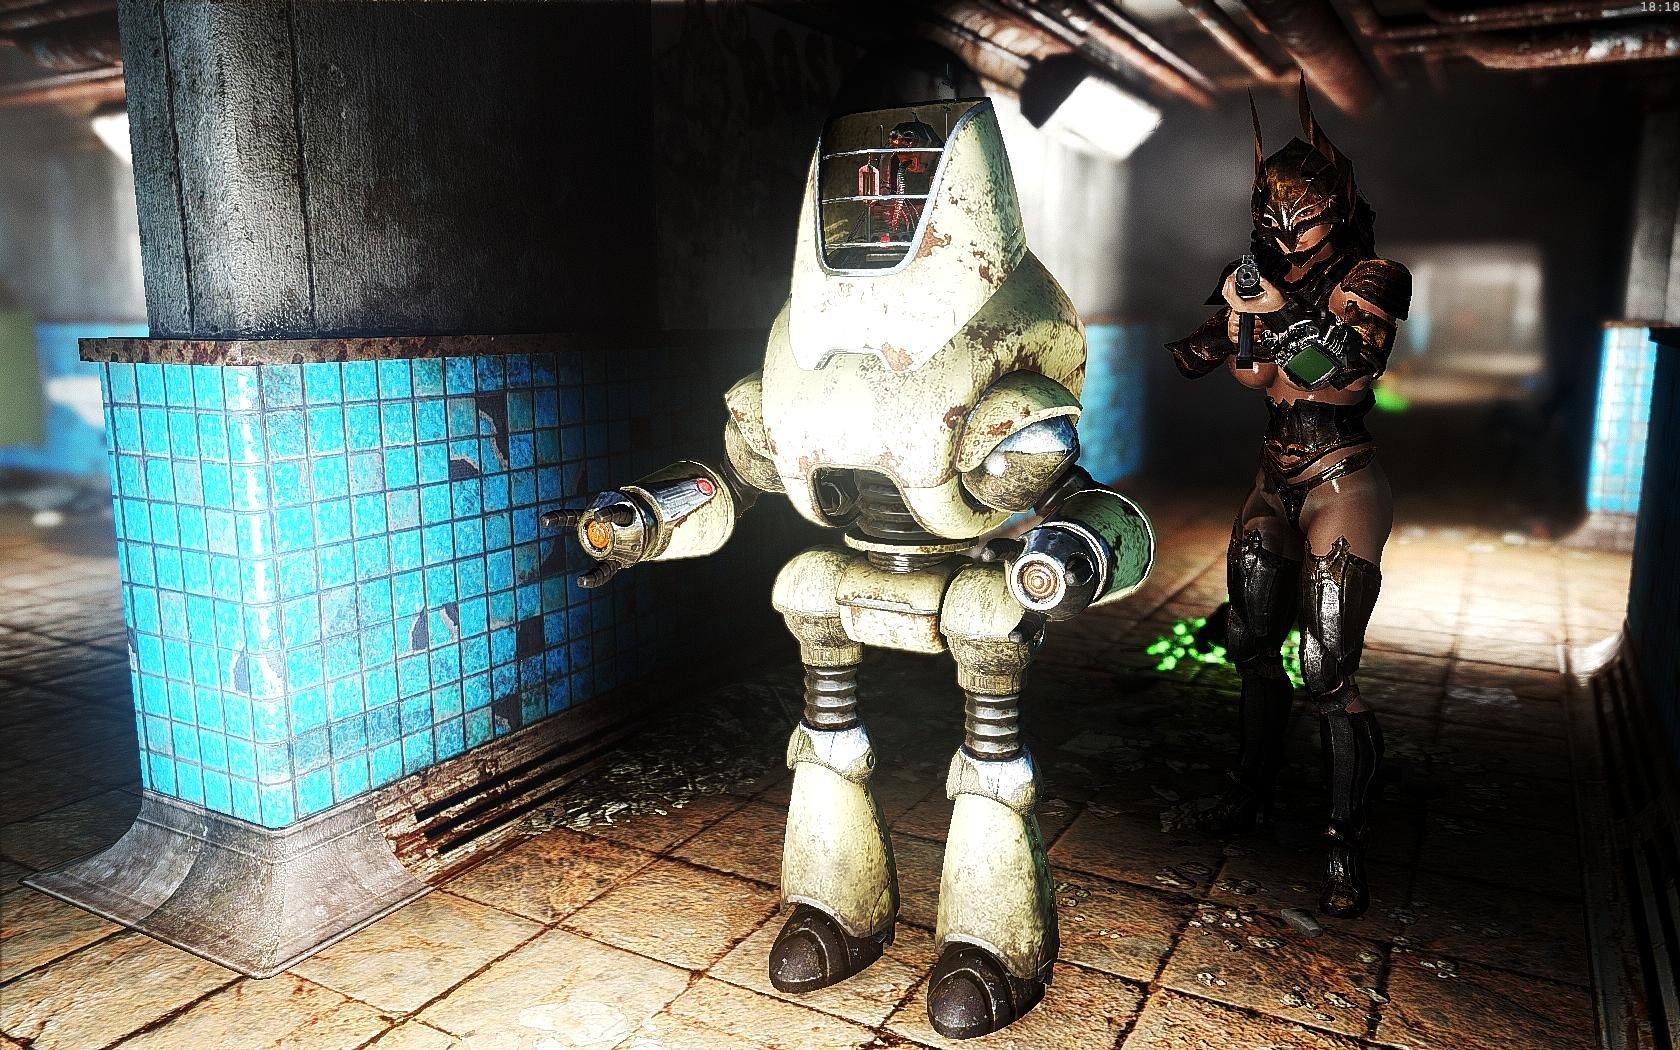 Fallout4 2019-02-05 18-18-41-61